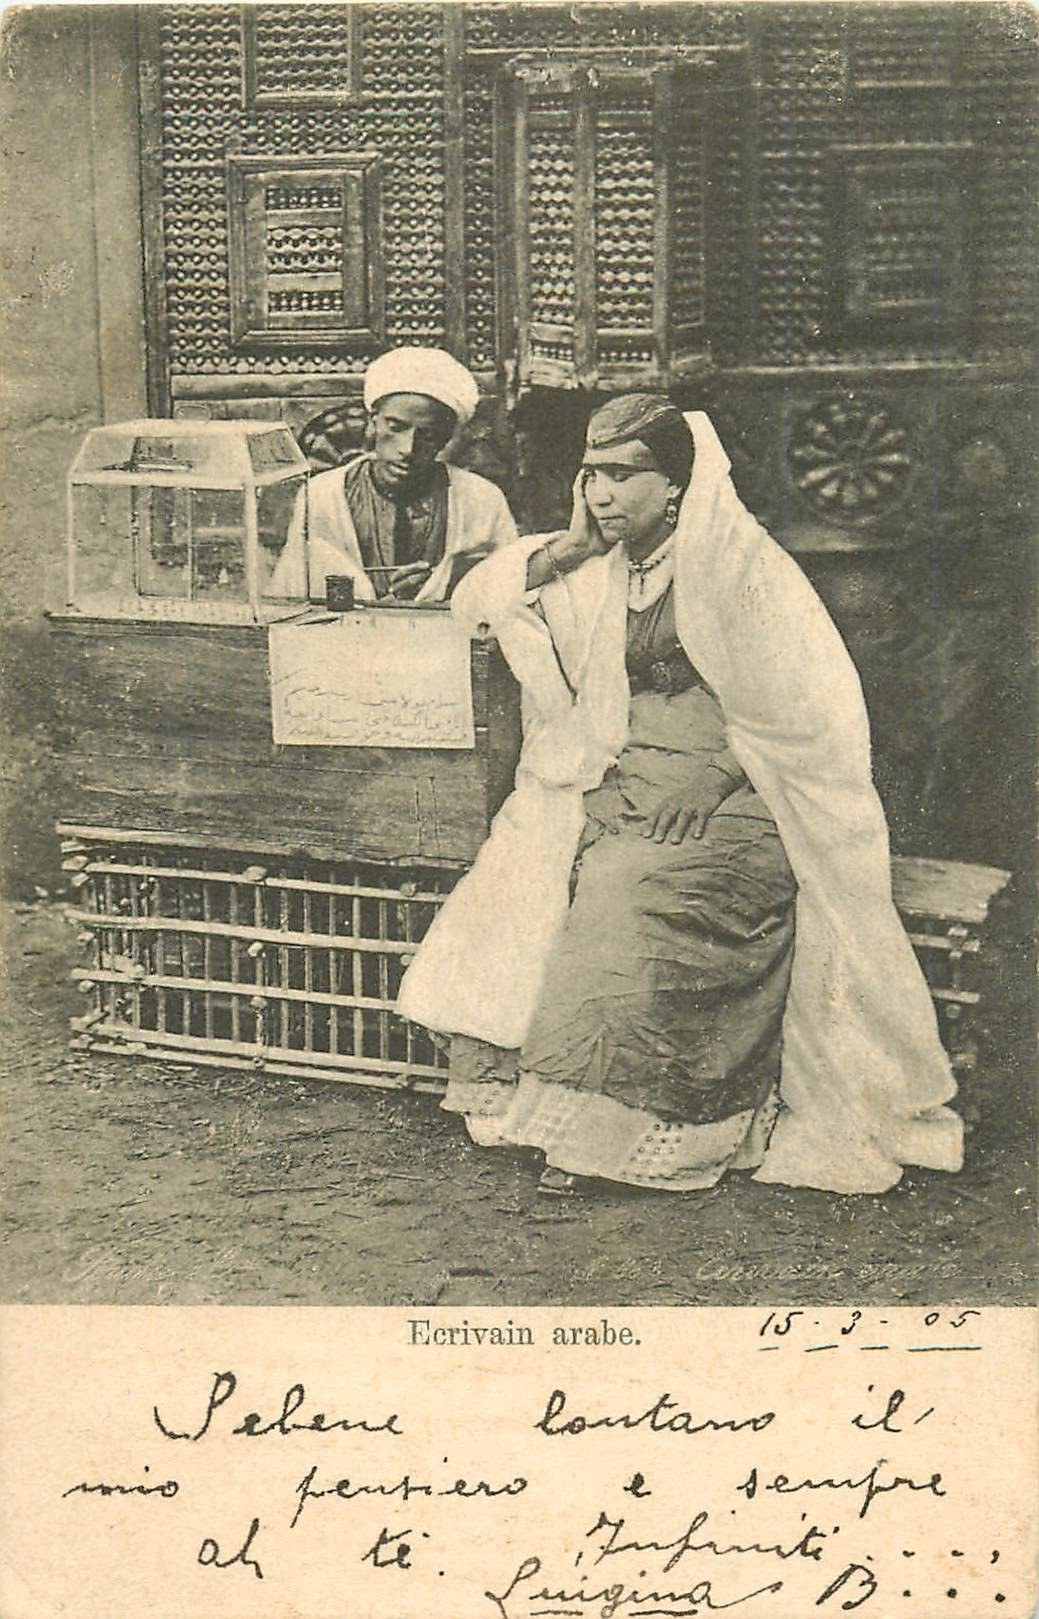 EGYPTE. Ecrivain arabe 1905